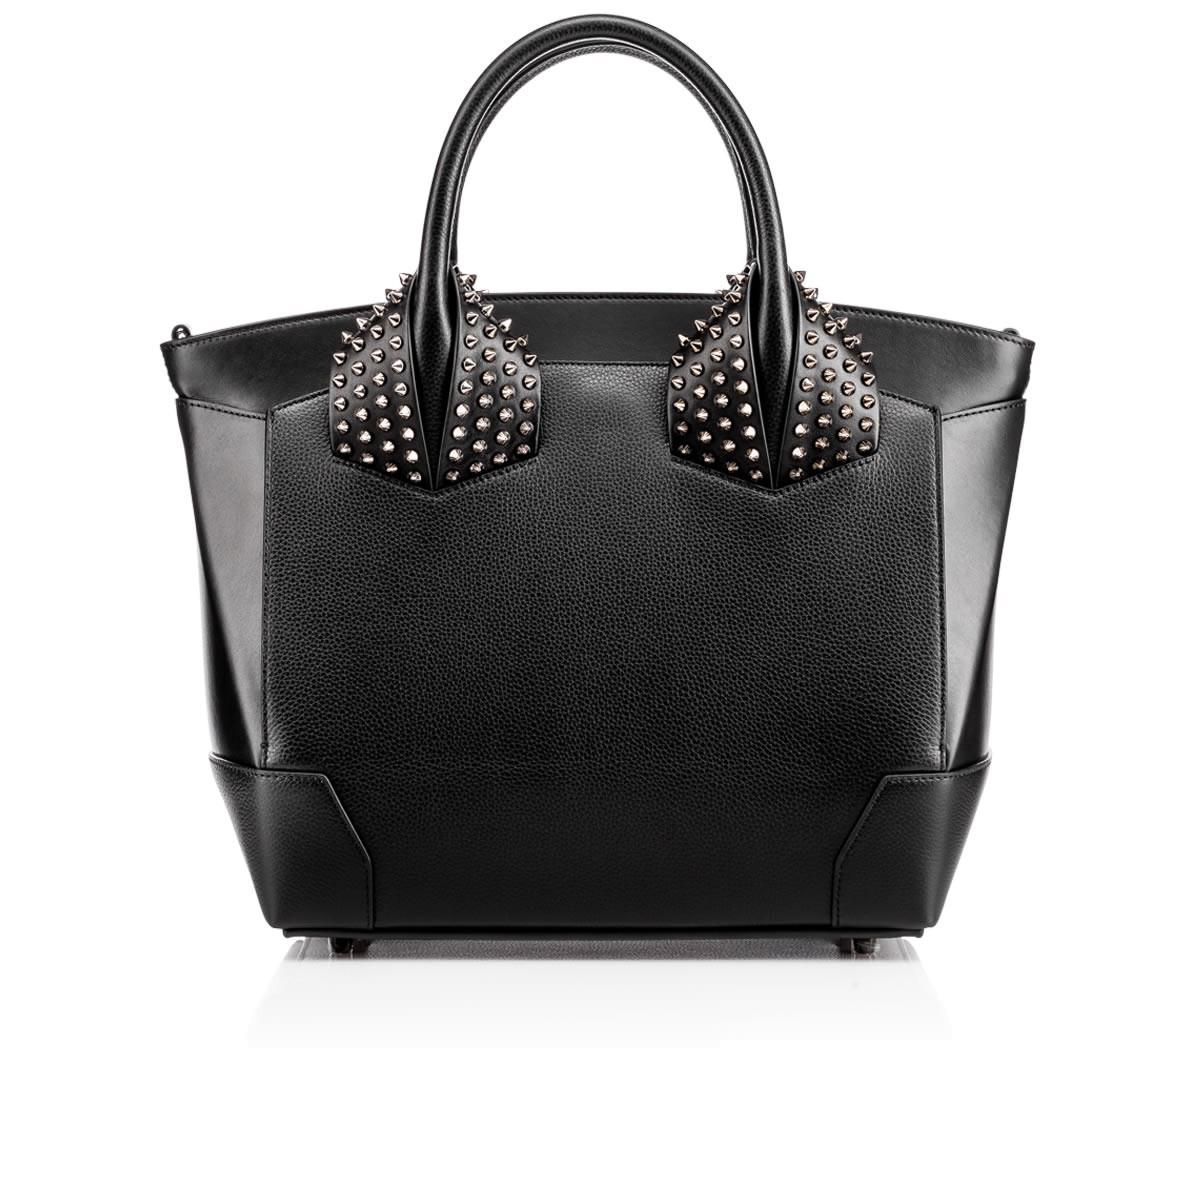 Foto de El nuevo 'it bag' de Christian Louboutin se llama 'Eloise' (7/8)